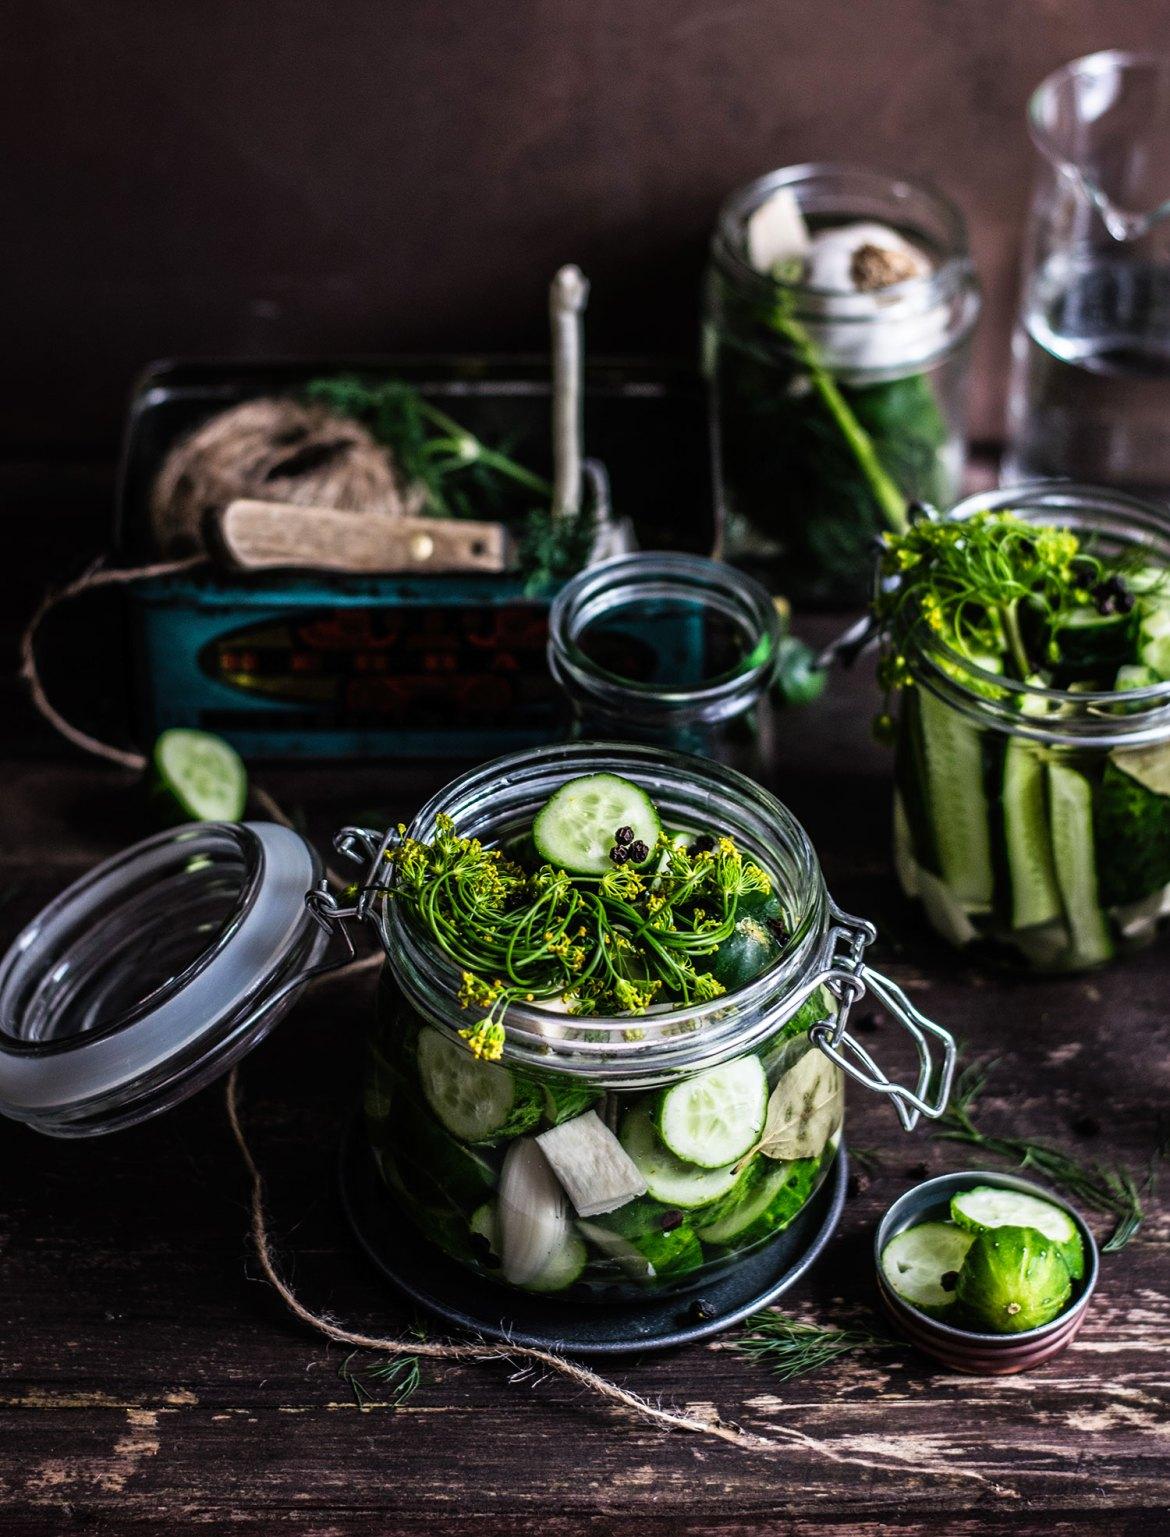 Pickling can be a beautiful art form - Photo: Monika Grabkowska